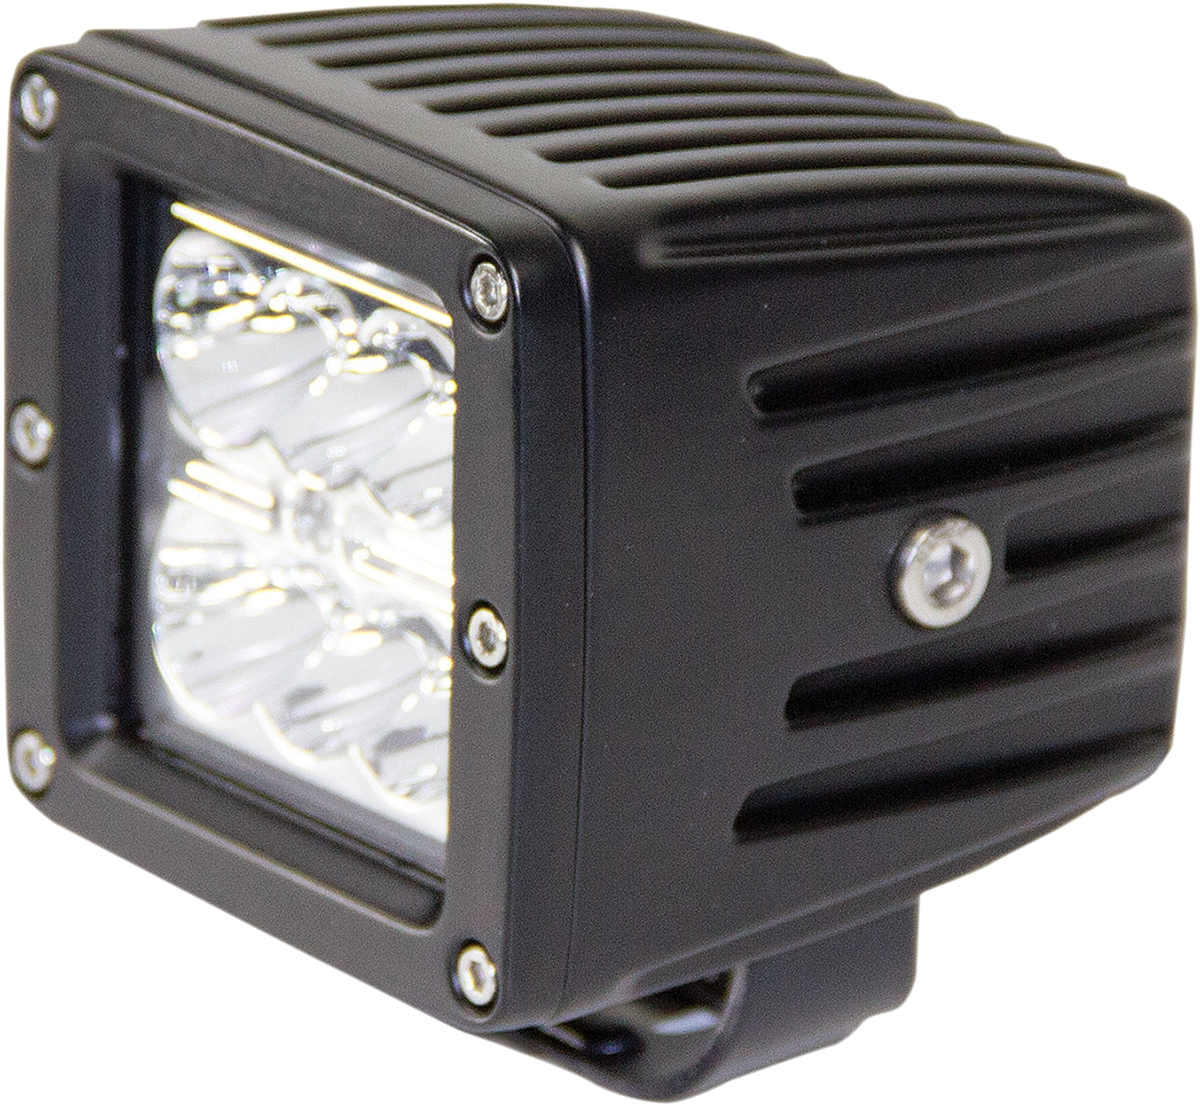 Seizmik LED Light Bar